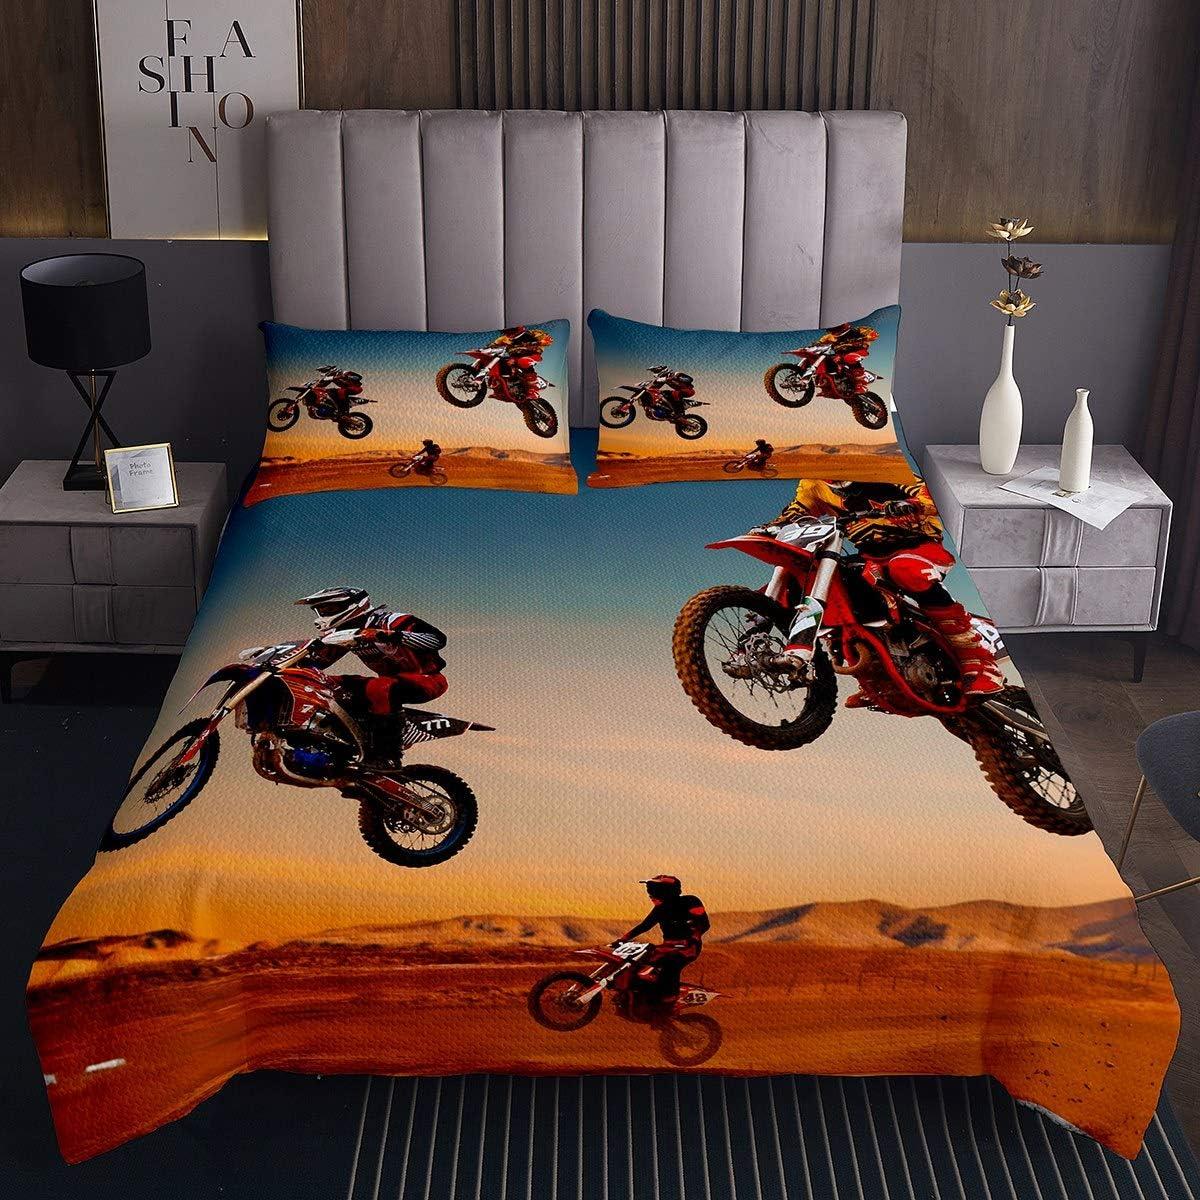 Blue Erosebridal Kids Dirt Bike Quilted Coverlet Queen Size Motocross Rider Bedding Set Motorbike Sport Bedspread for Boys Girls Teens Motorcycle Extreme Sport Bedding Collection for Living Room